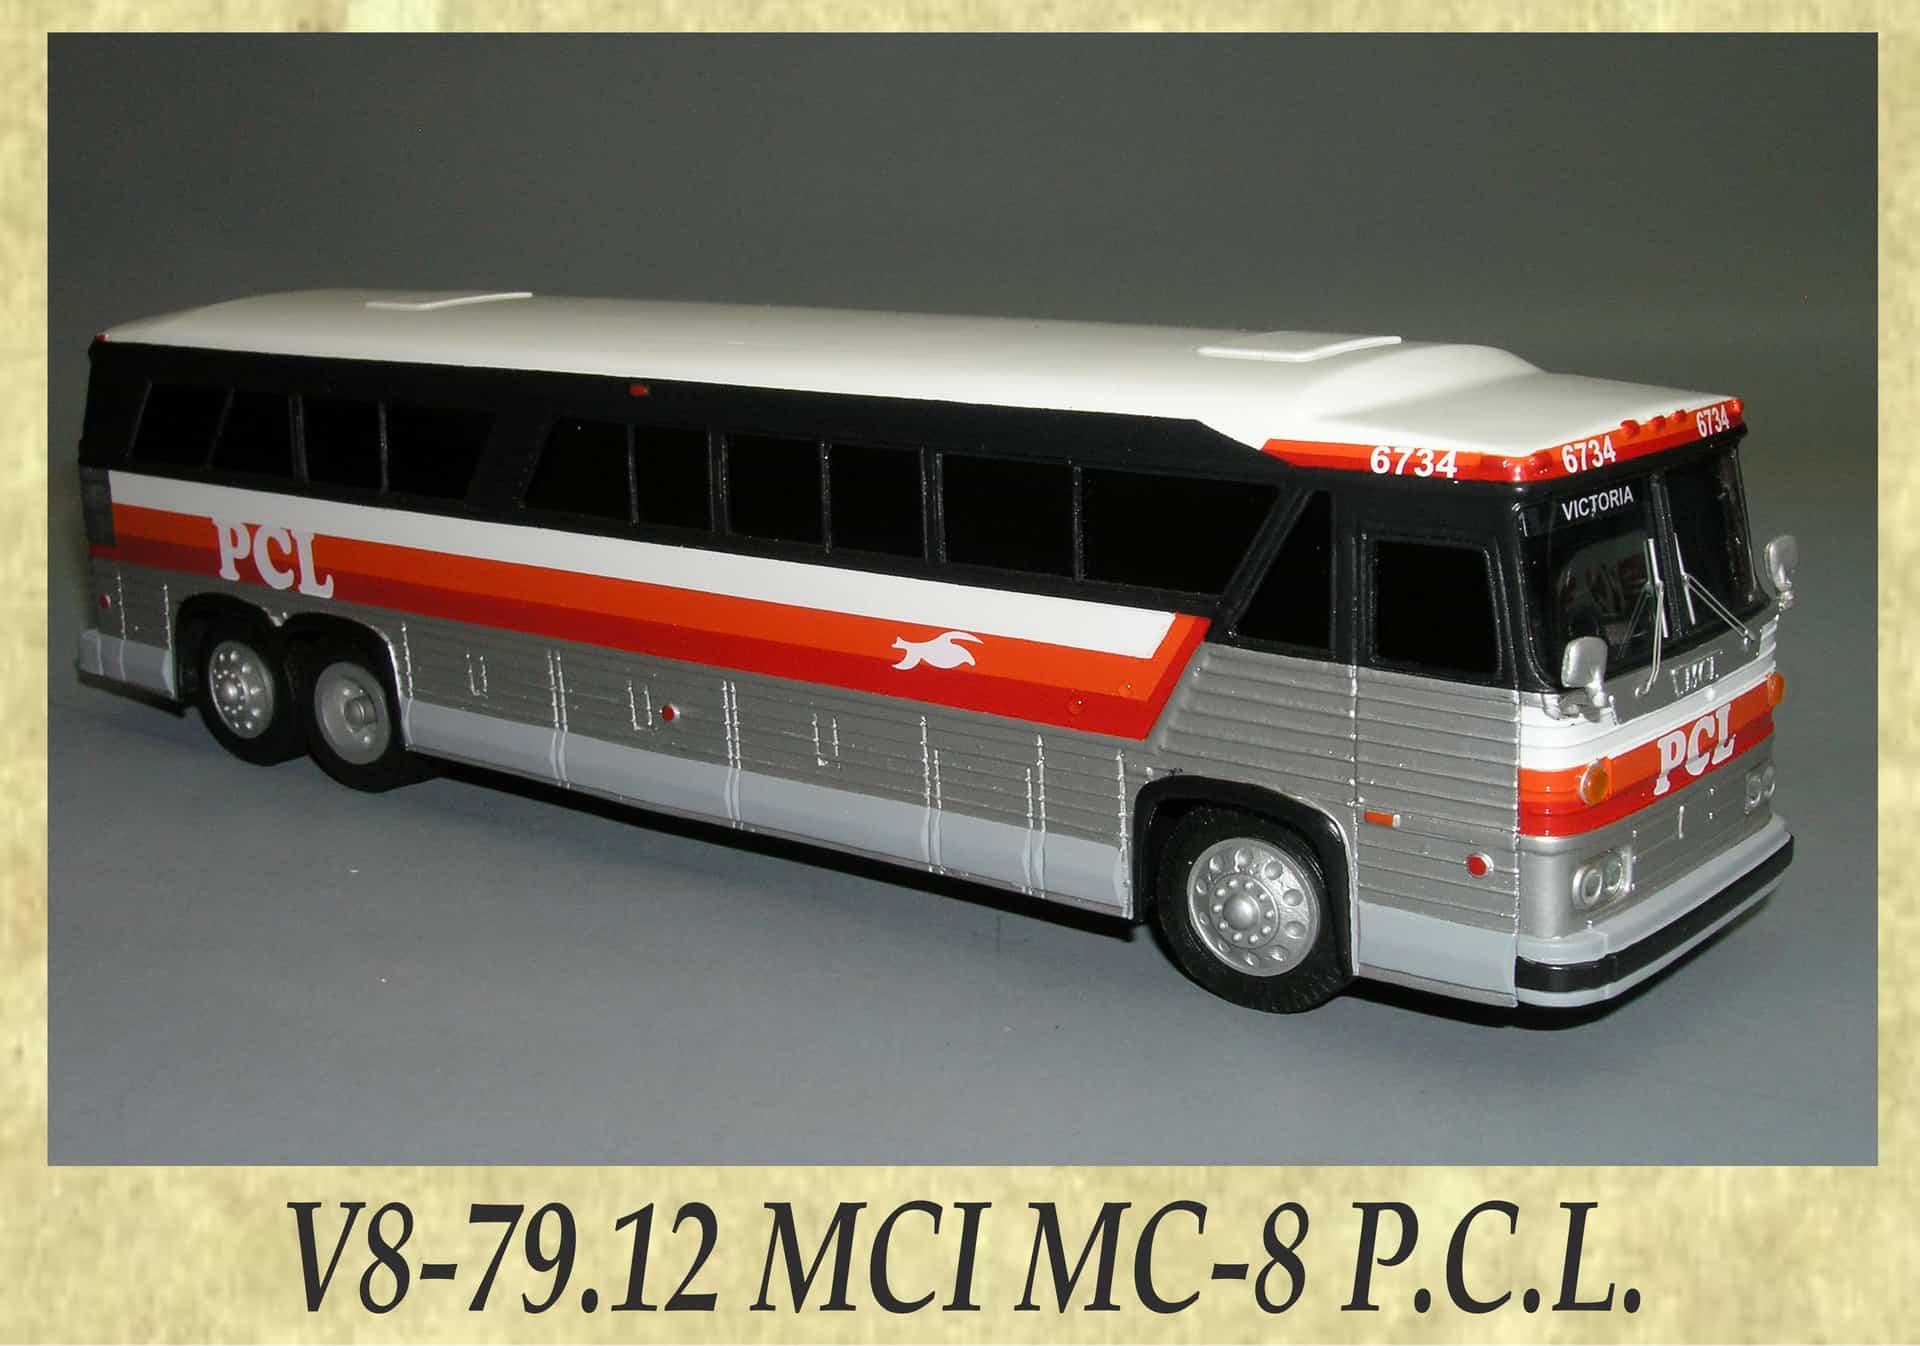 V8-79.12 MCI MC-8 P.C.L.